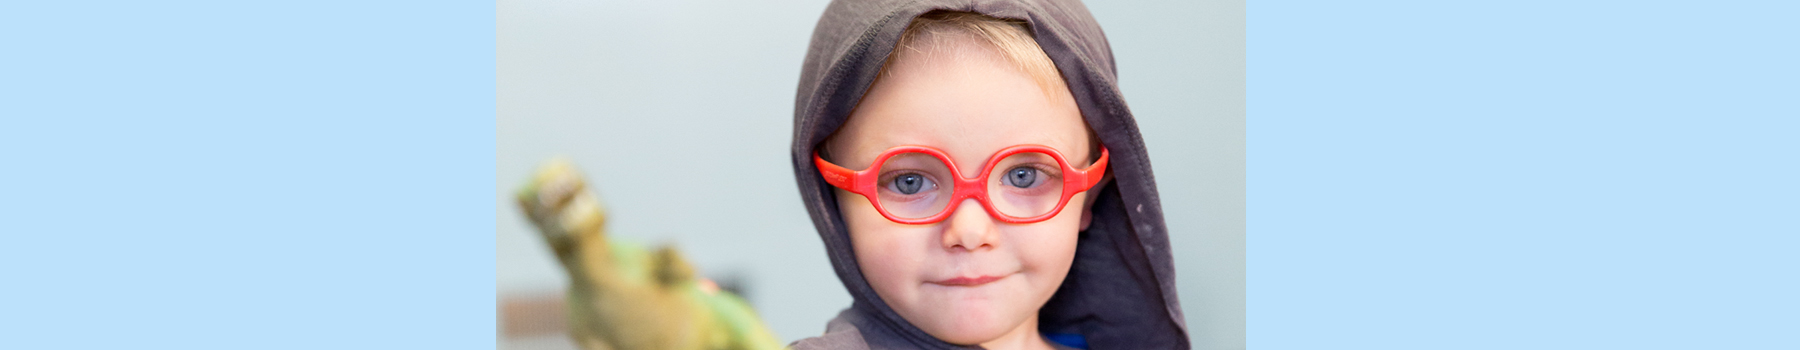 preschool-home-slider-oct2018-2